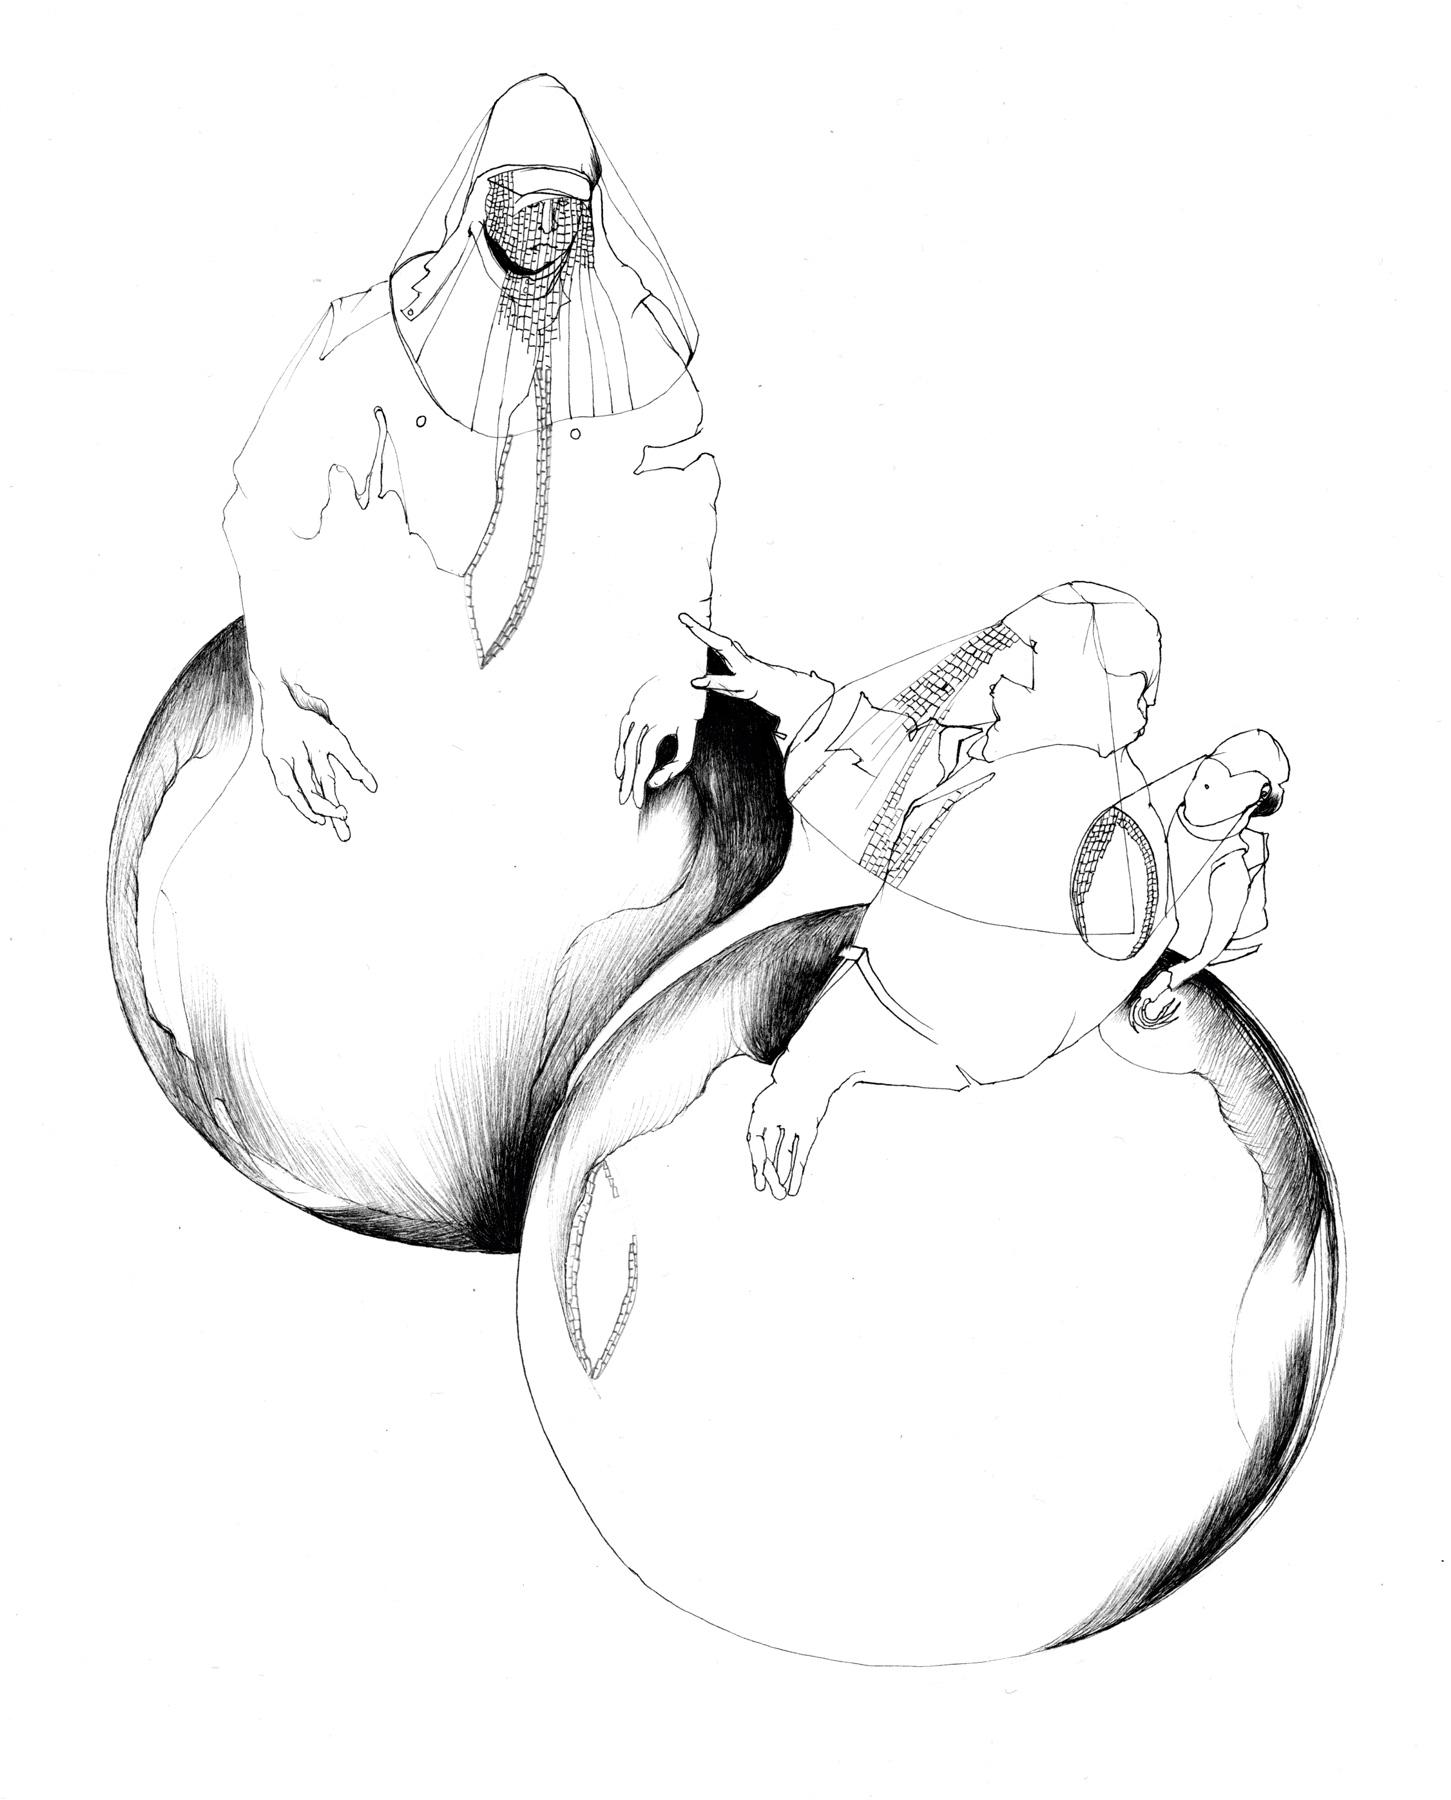 Nina Annabelle Märkl   Shadowboxers – Artist book   Ink on paper   35 x 26 cm   2011